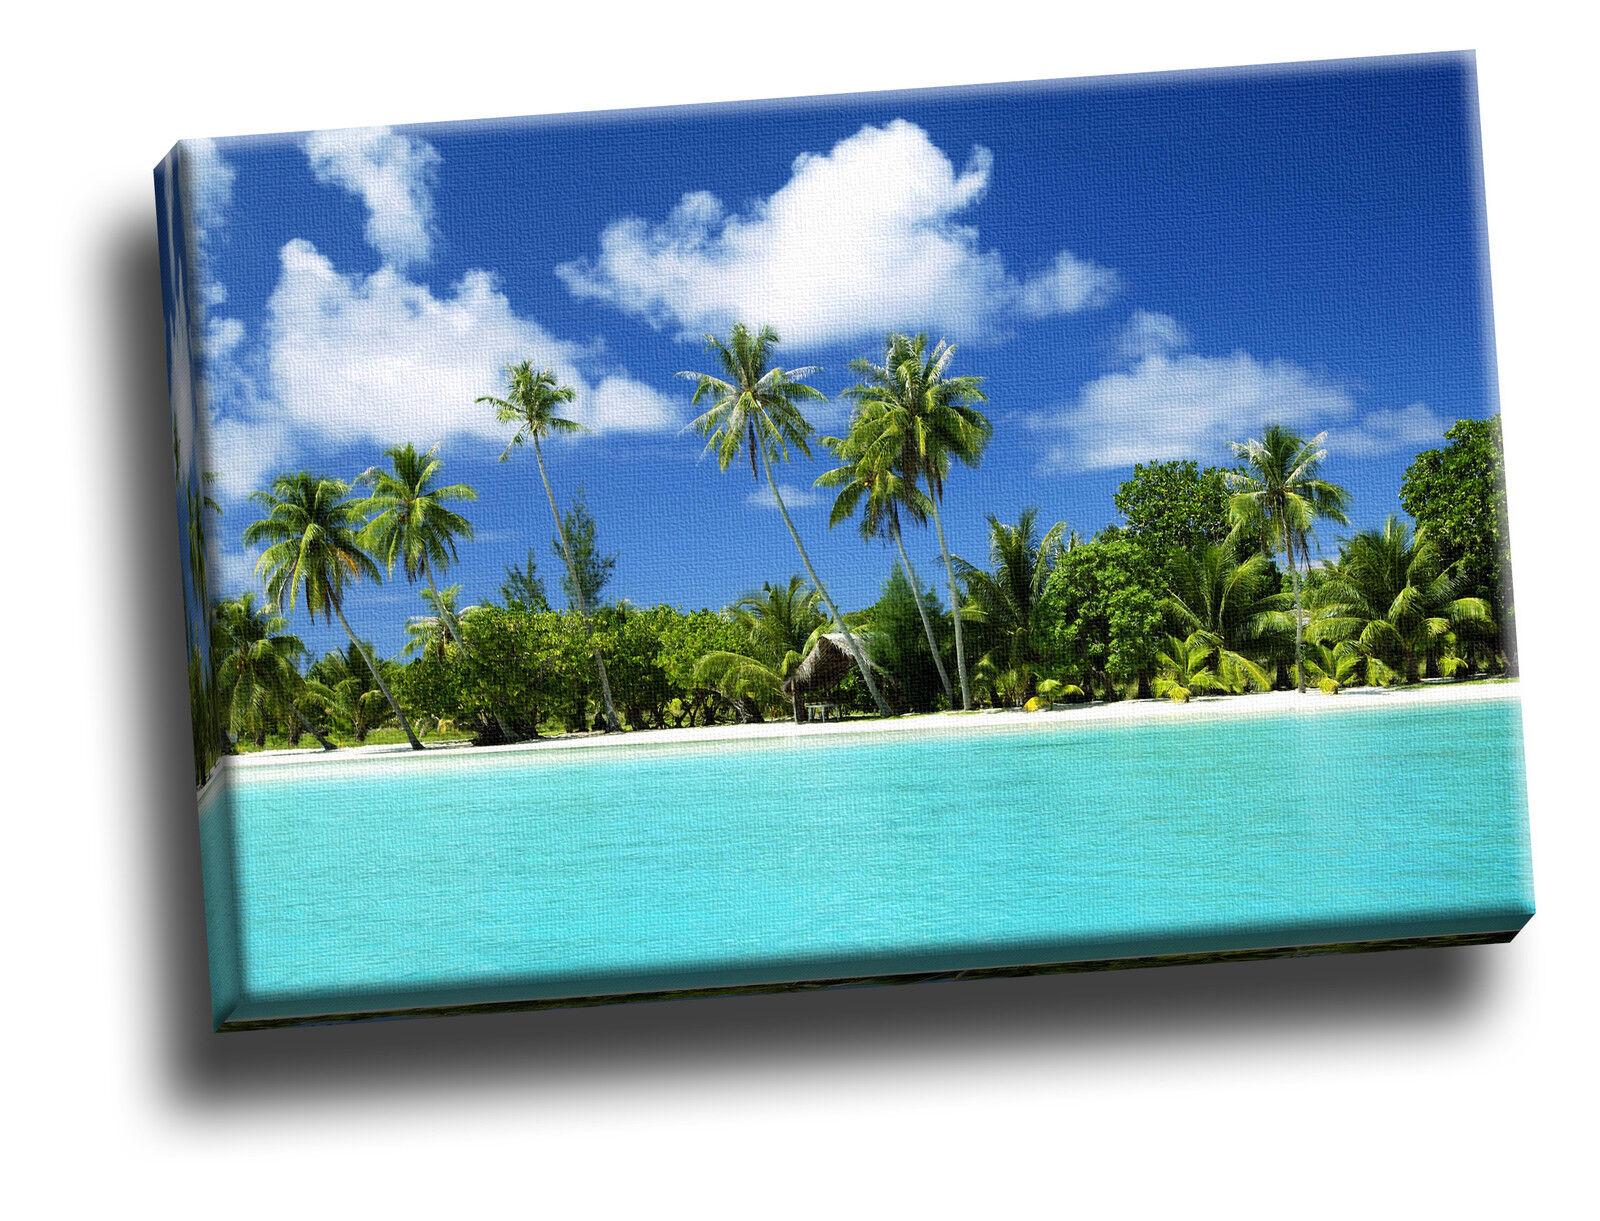 Tropical Retreat Giclee Canvas Seascape Picture Art